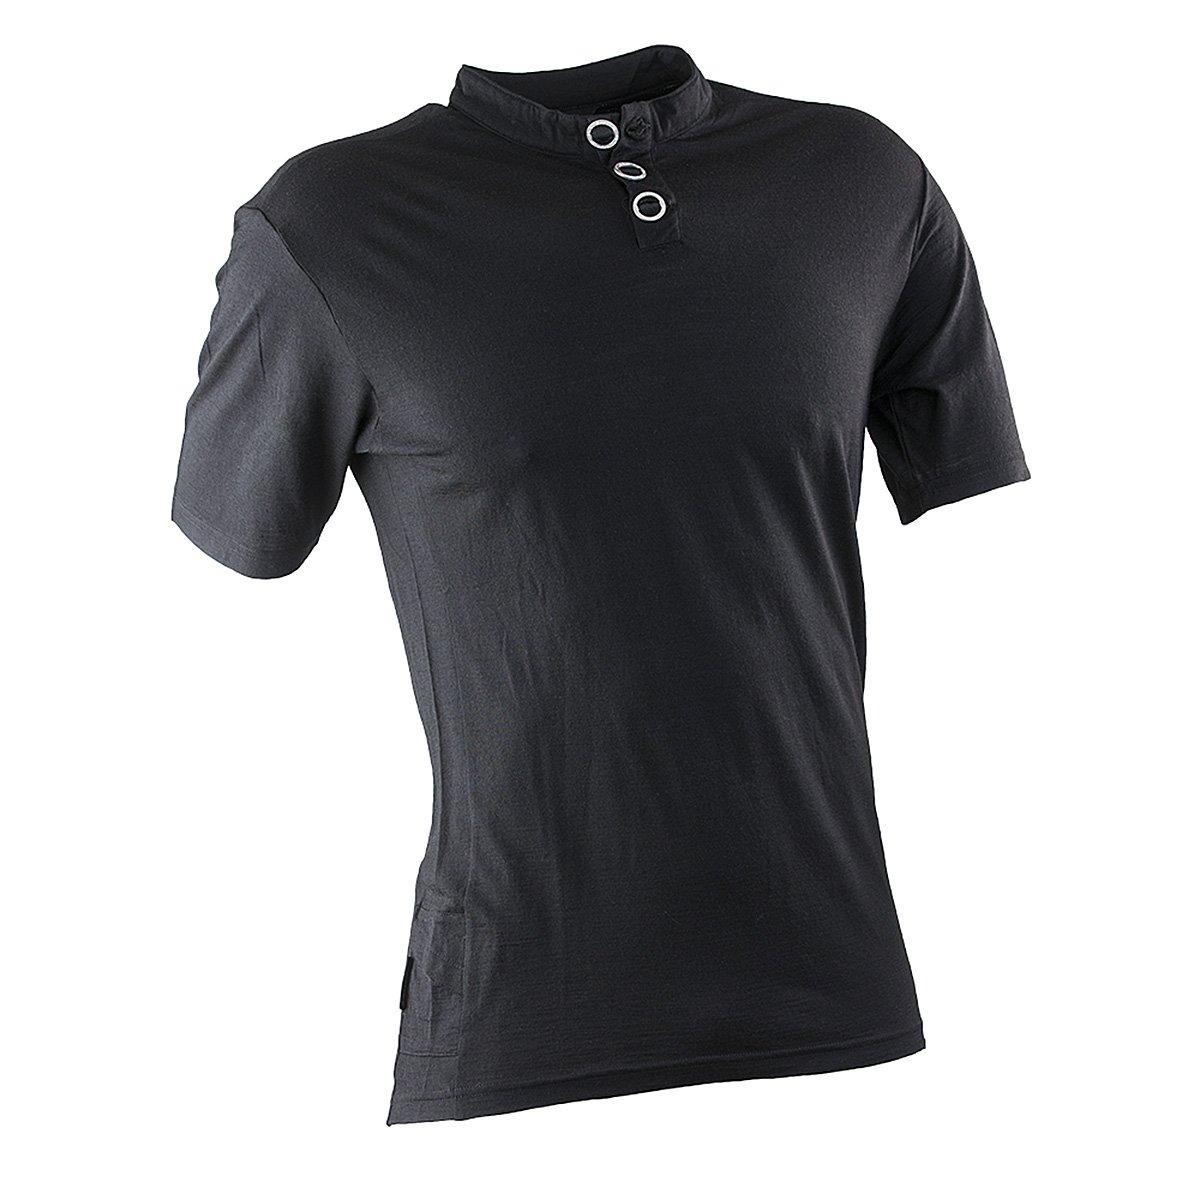 RaceFace Henley Short Sleeve Jersey